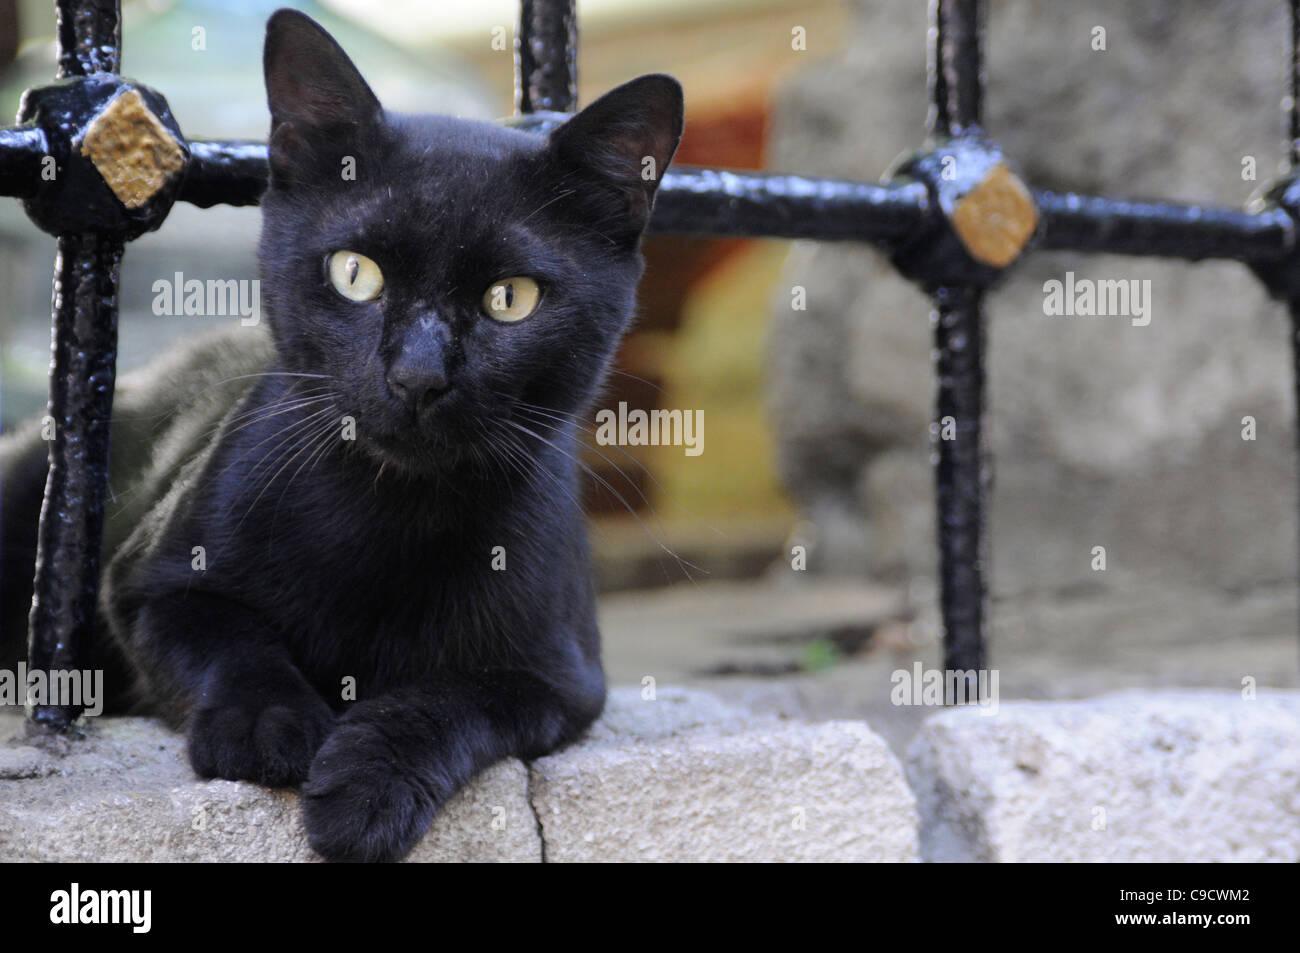 Black cat in Istanbul, Turkey - Stock Image